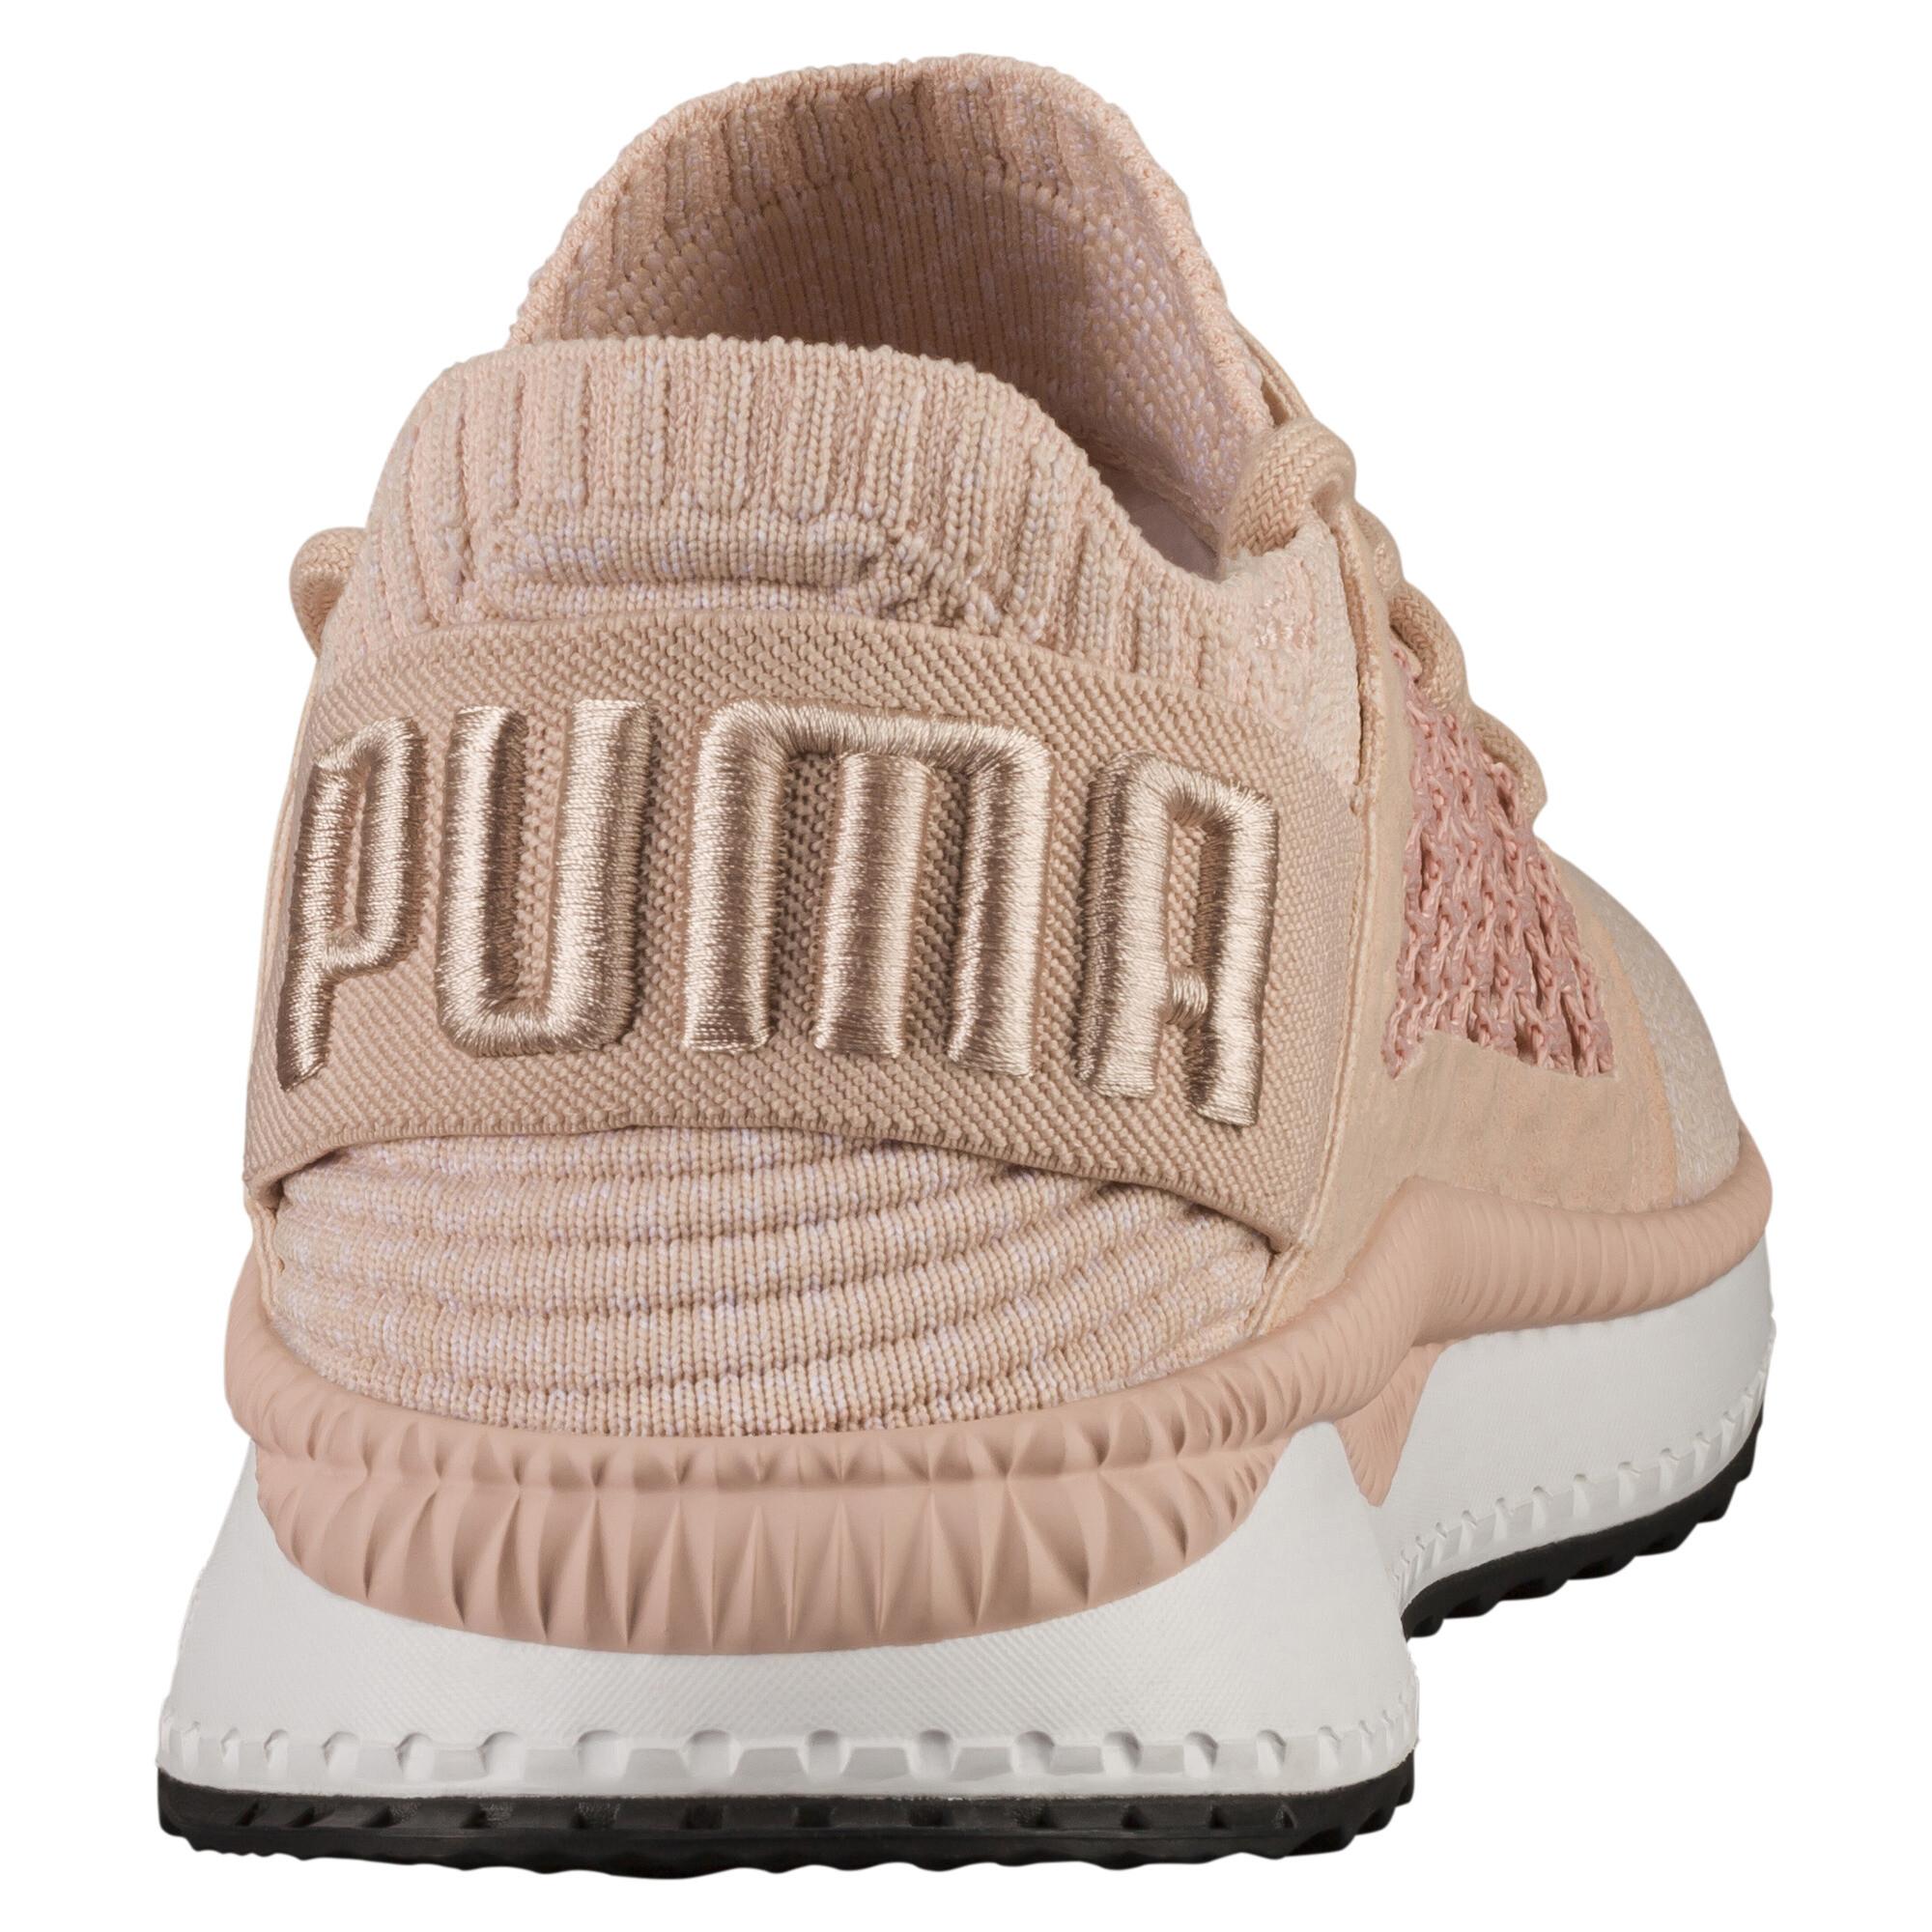 PUMA-TSUGI-NETFIT-evoKNIT-Sneaker-Frauen-Schuhe-Neu Indexbild 20